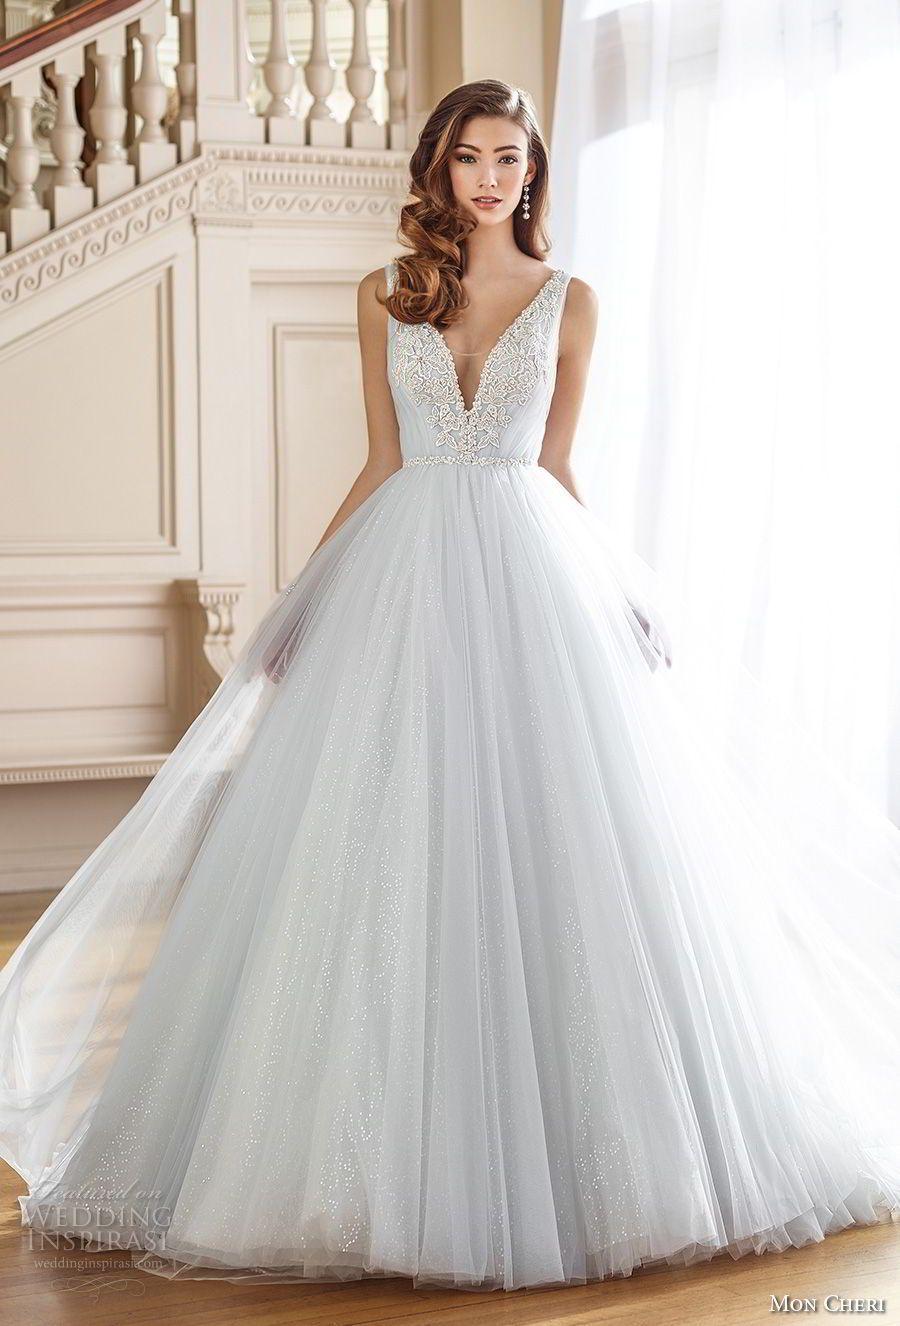 Mon Cheri Fall 2017 Wedding Dresses | Chapel train, Tulle skirts and ...